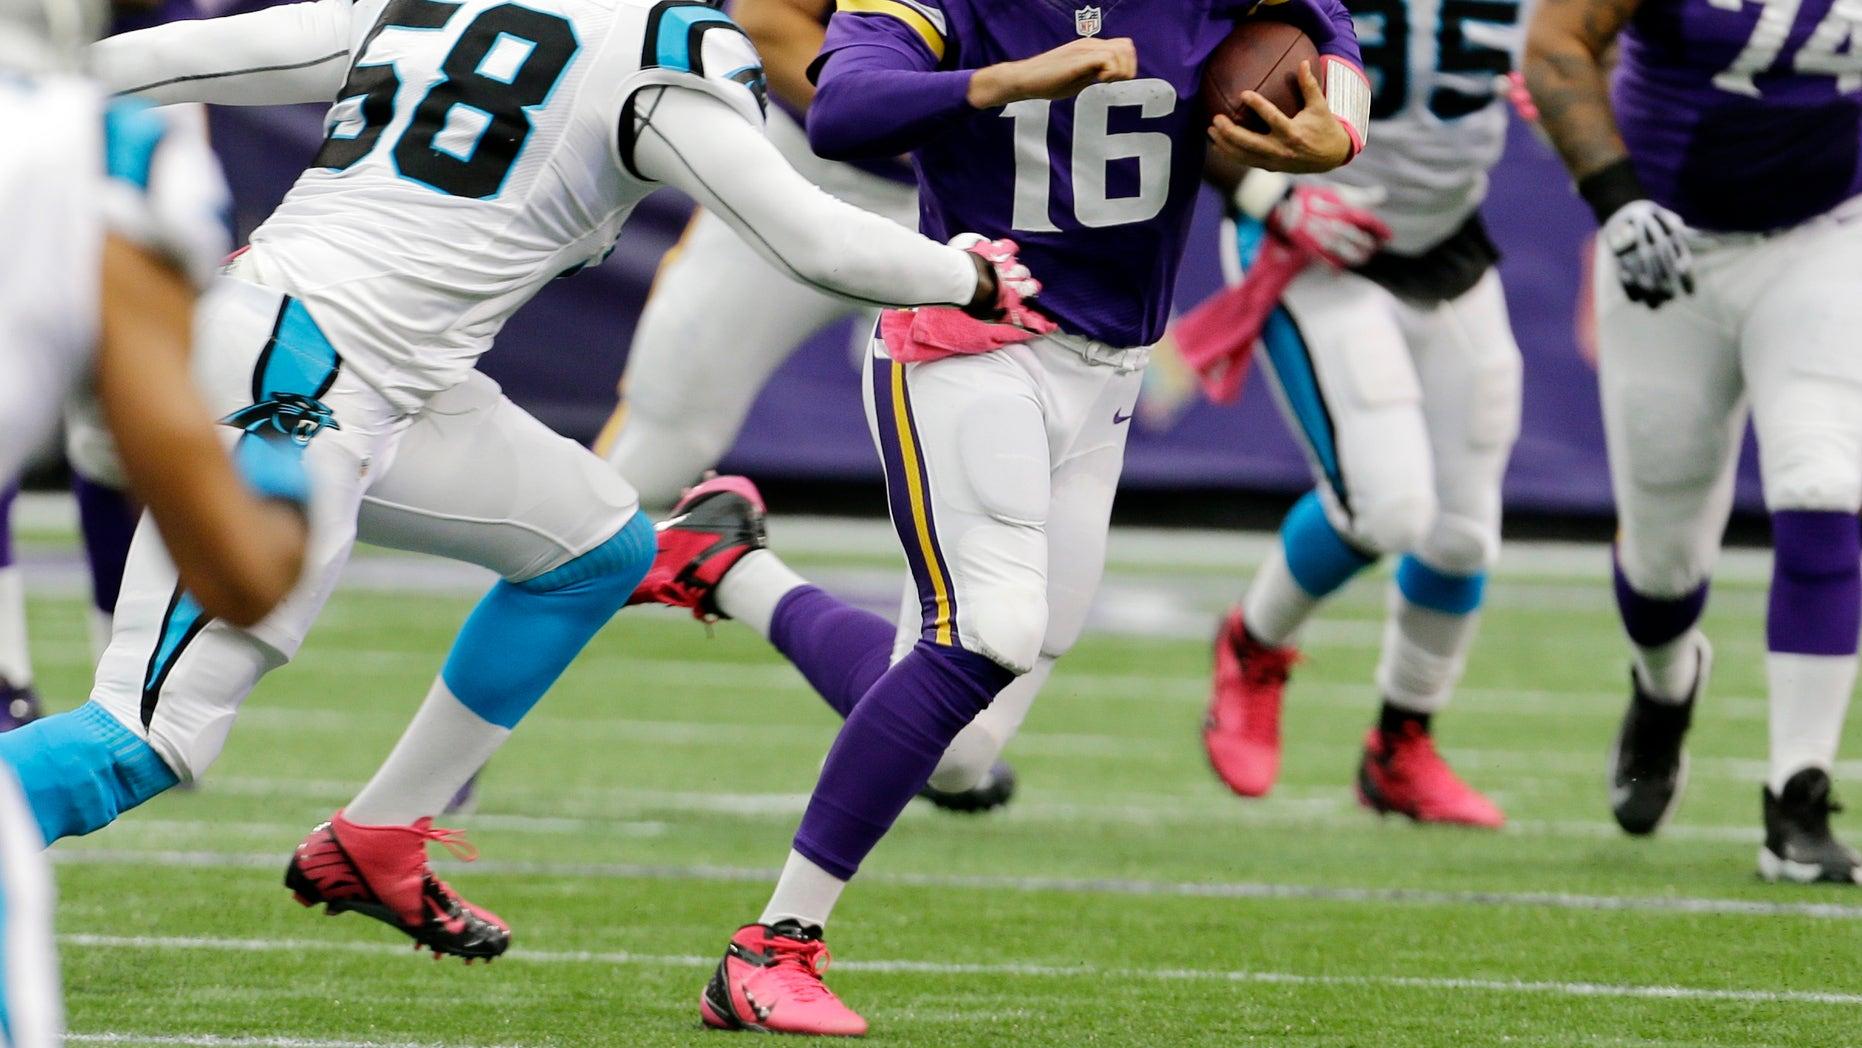 Carolina Panthers outside linebacker Thomas Davis, left, chases down Minnesota Vikings quarterback Matt Cassel (16) as he runs during the first half of an NFL football game in Minneapolis, Sunday, Oct. 13, 2013. (AP Photo/Ann Heisenfelt)